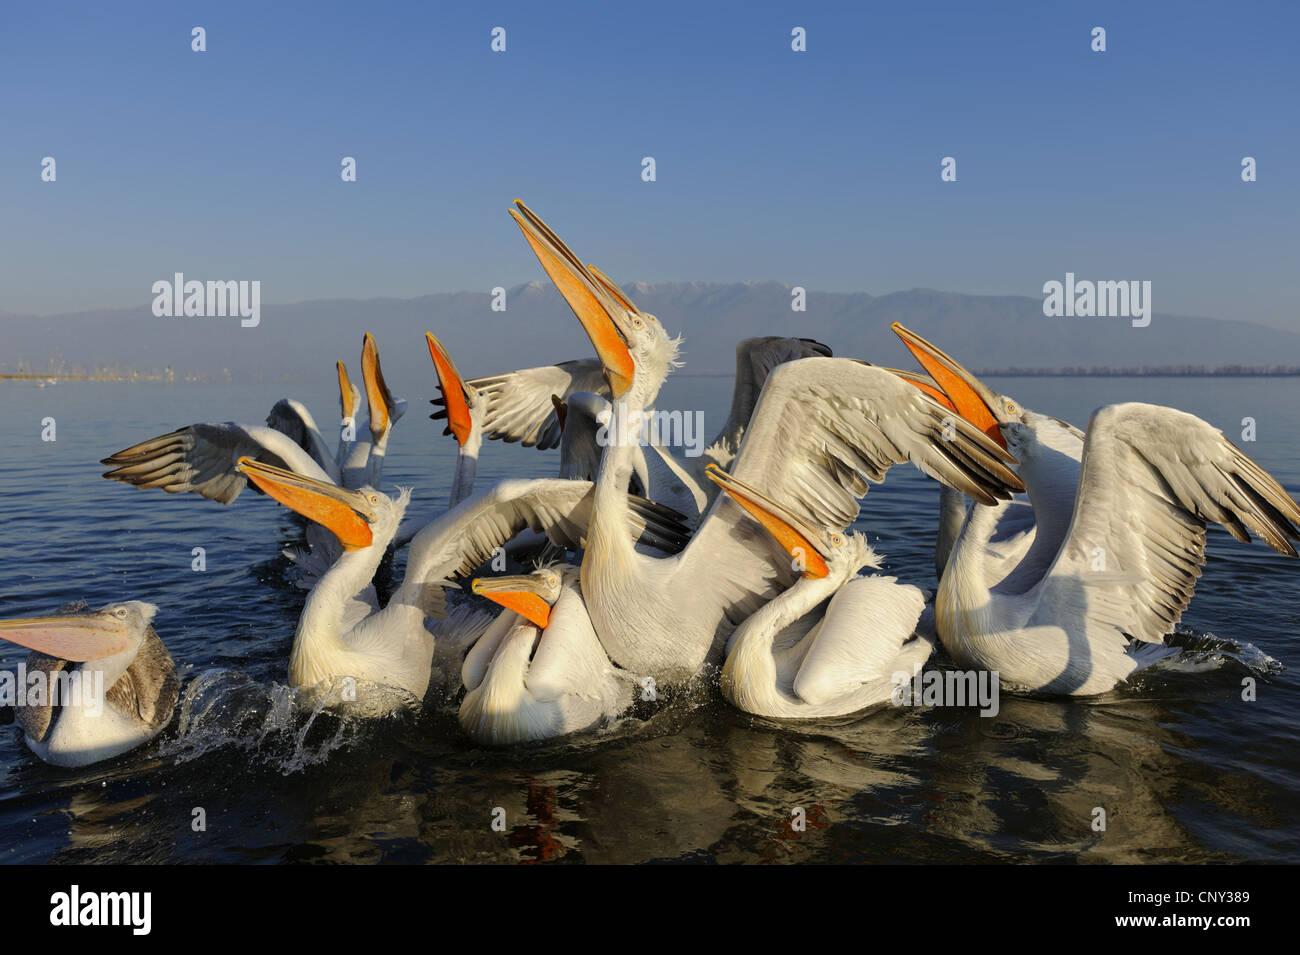 Dalmatian pelican (Pelecanus crispus), swimming group looking up, is fed, Greece, Macedonia, Kerkini Lake - Stock Image